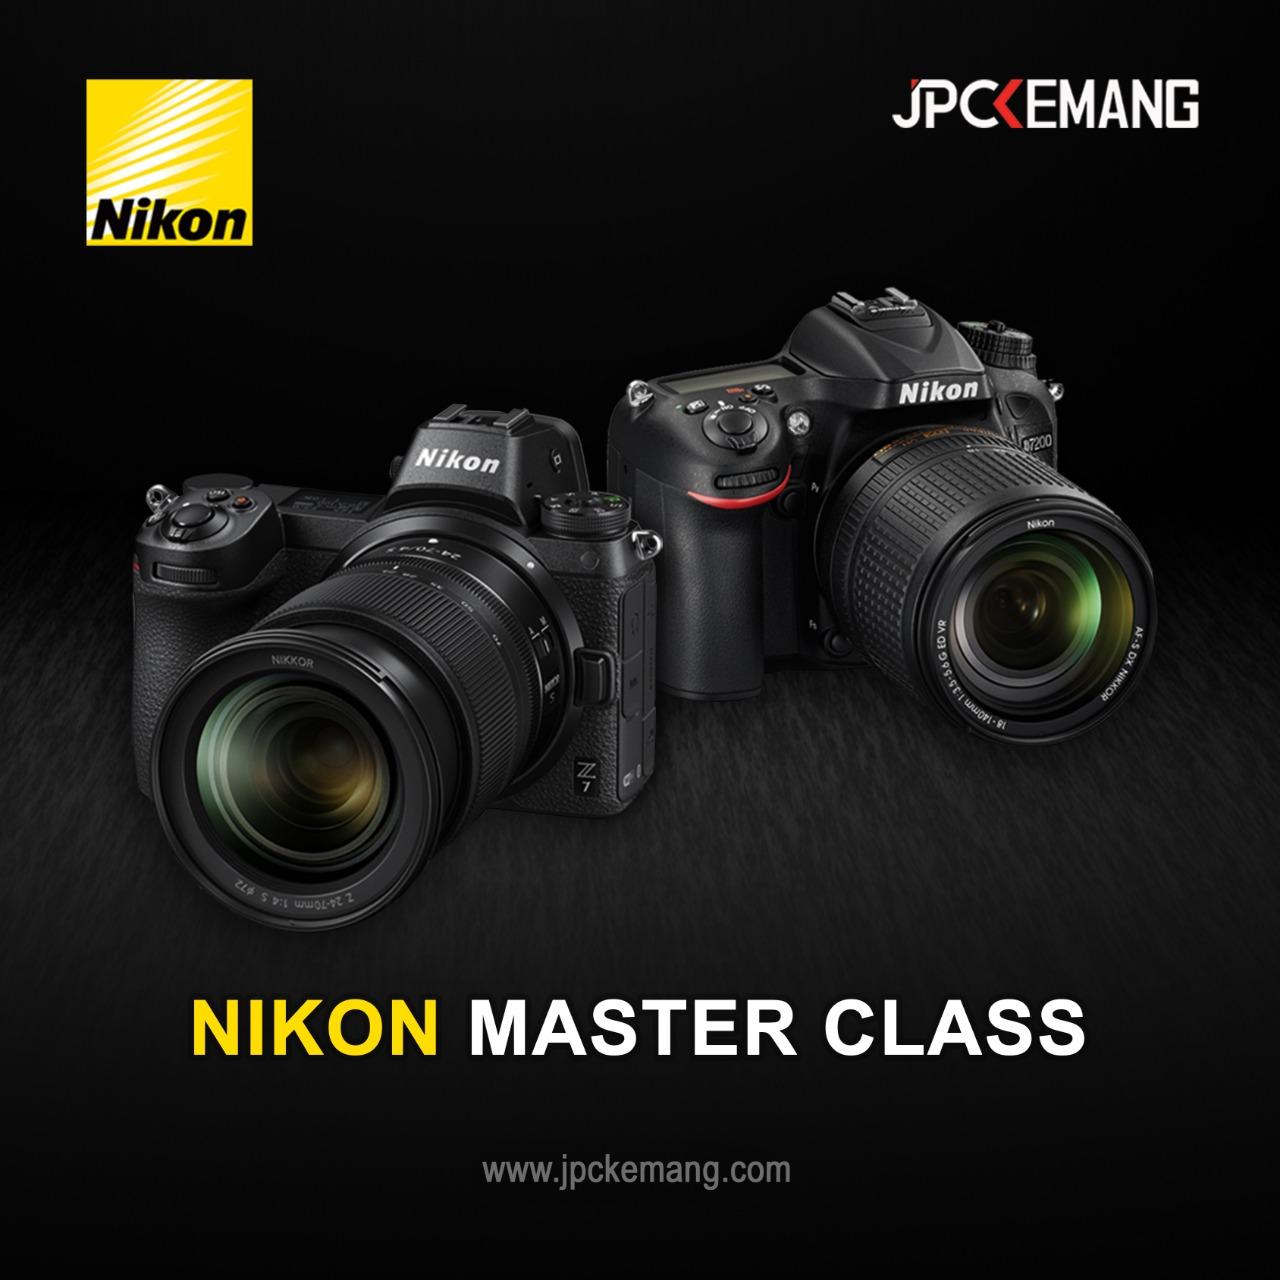 Nikon Masterclass